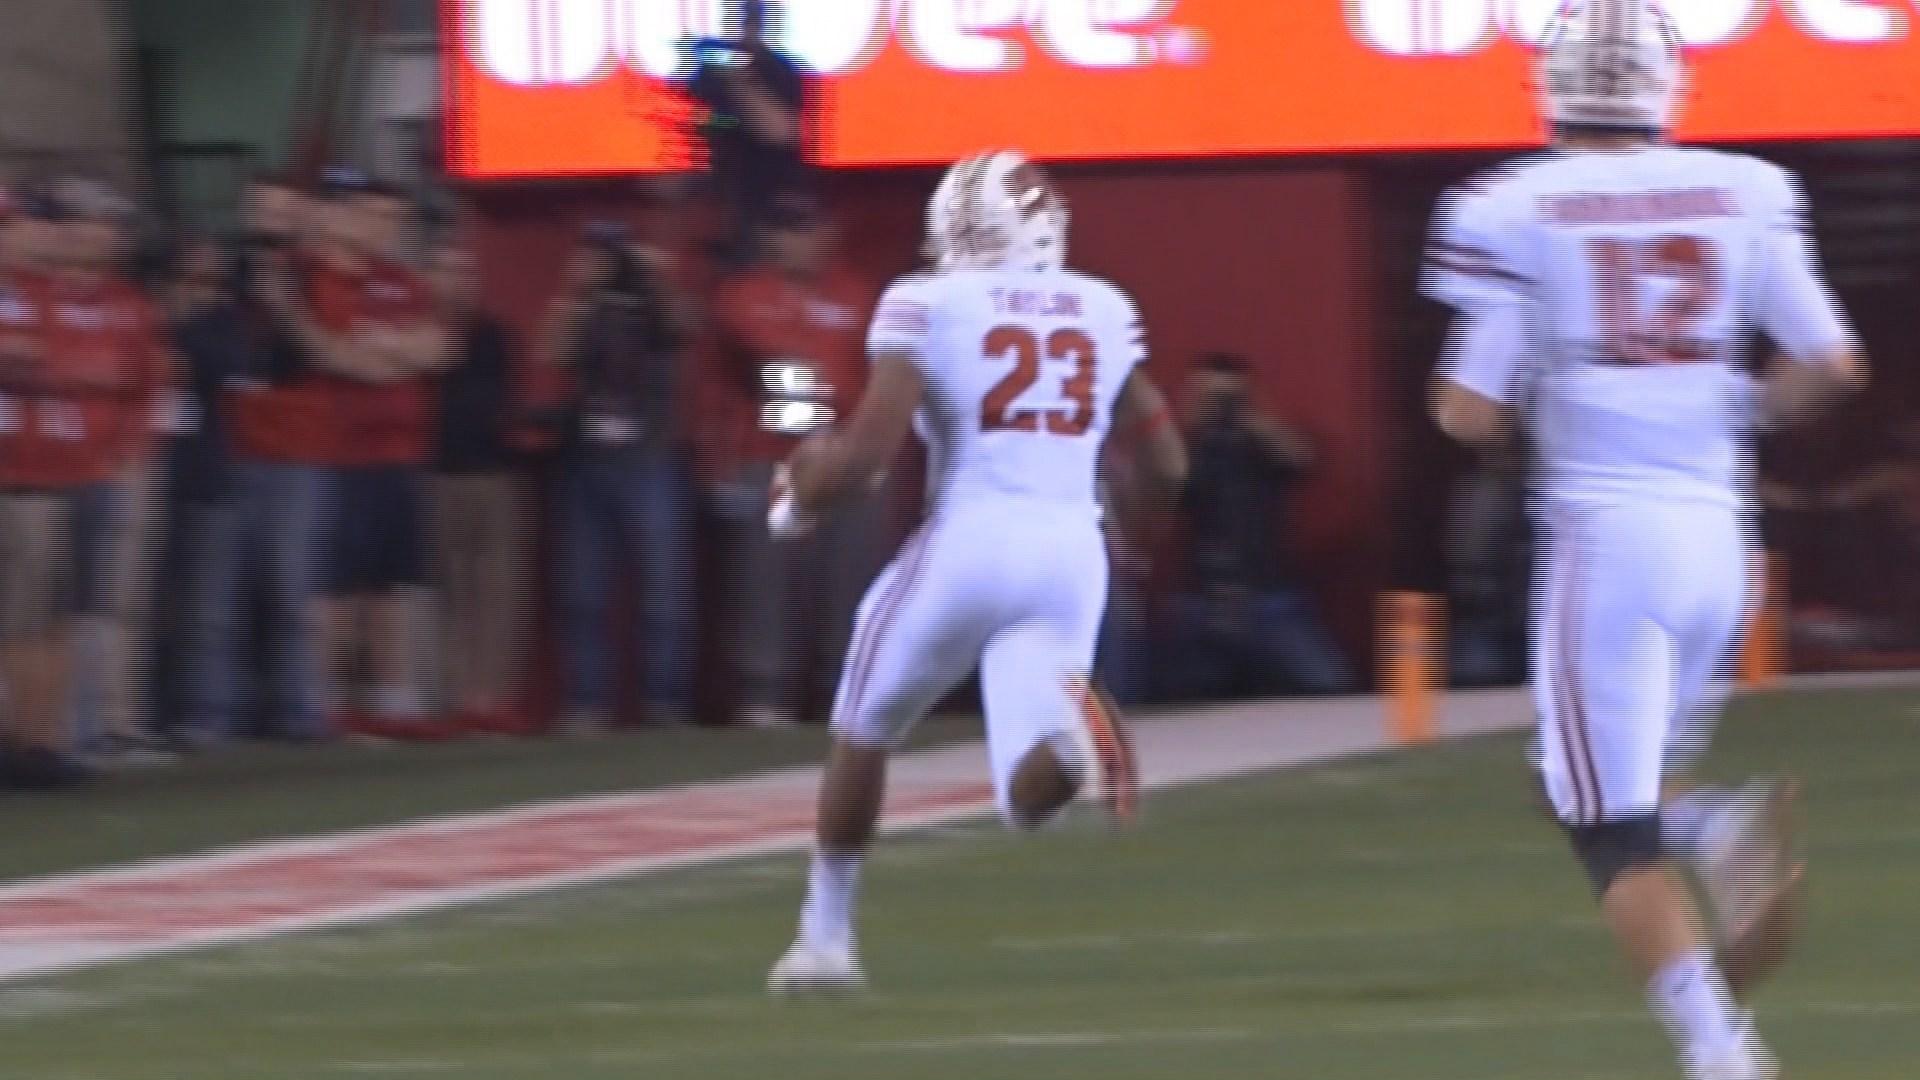 Wisconsin running back Jonathan Taylor ran for 249 yards in the Badgers' 38-17 win over Nebraska.